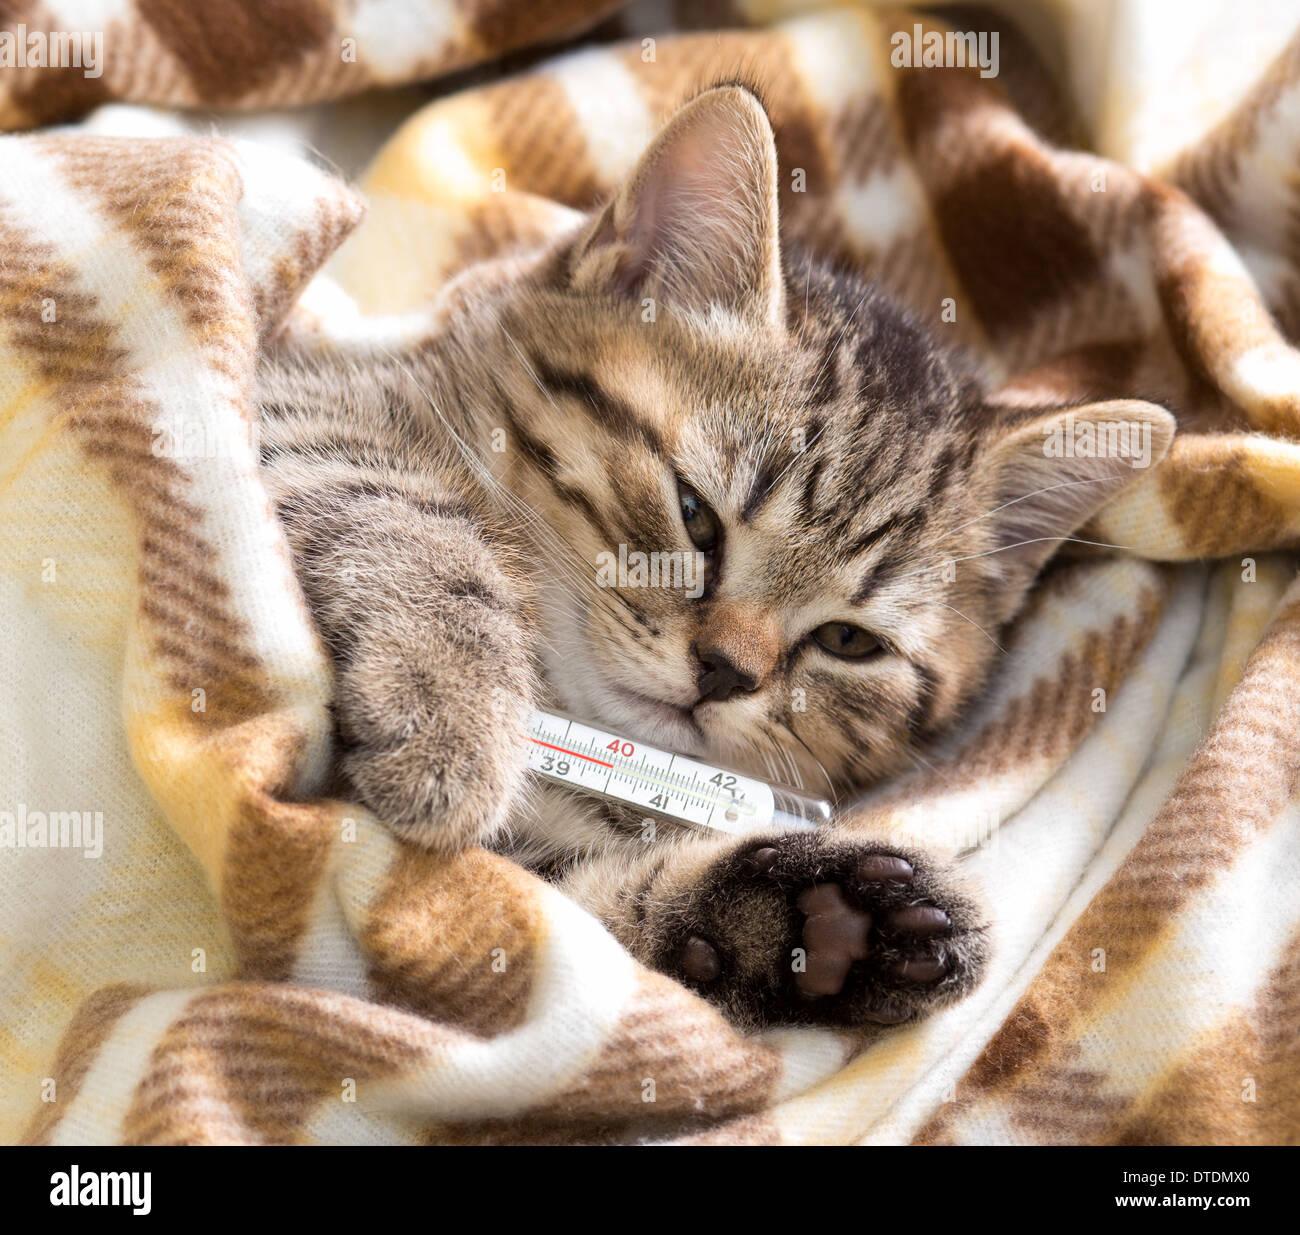 Malos gatito tumbado con temperatura alta Imagen De Stock